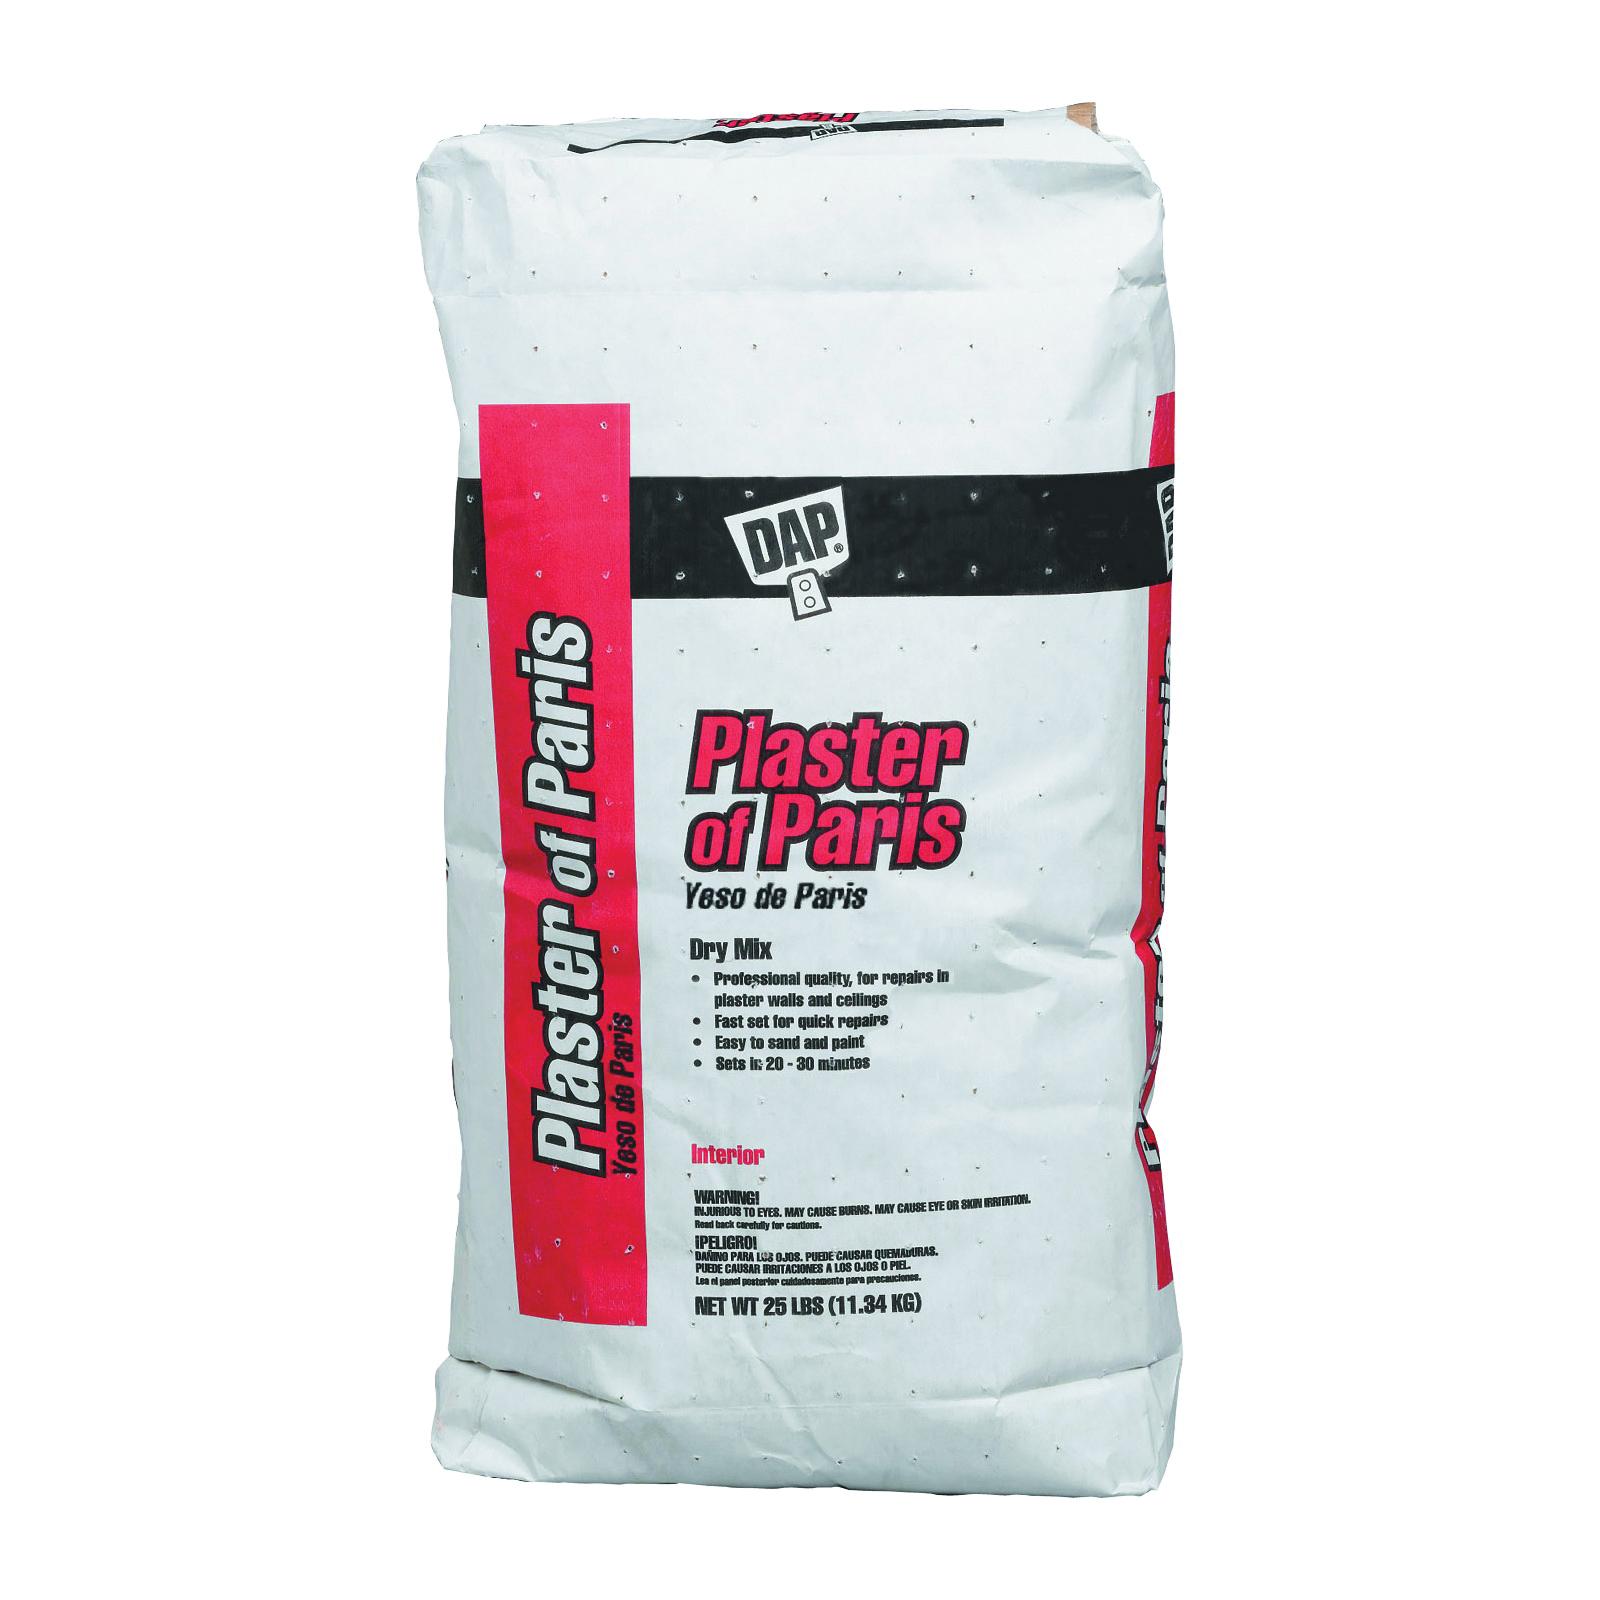 Picture of DAP 10312 Plaster of Paris, Powder, White, 25 lb Package, Bag